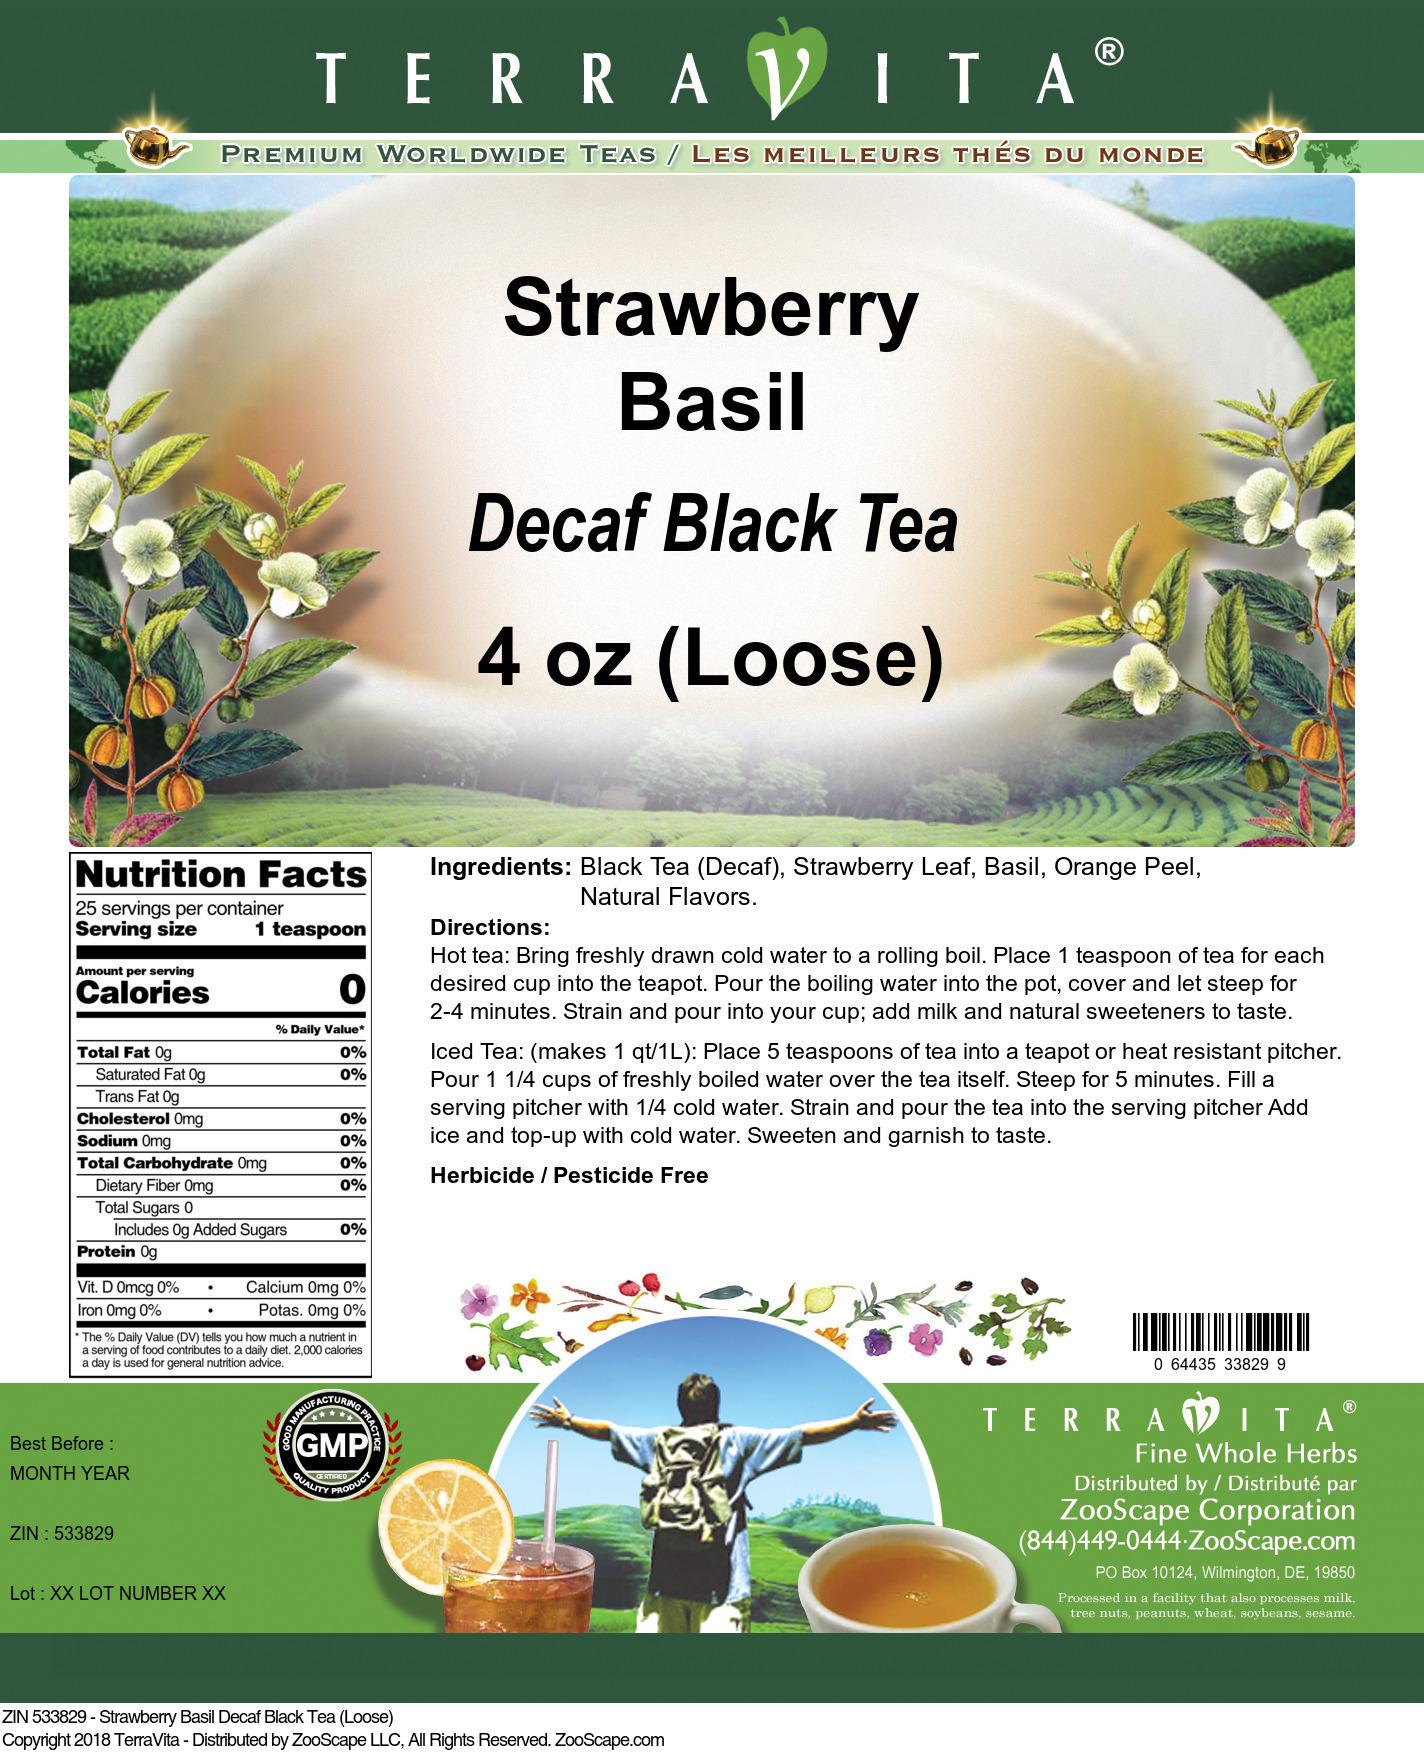 Strawberry Basil Decaf Black Tea (Loose)